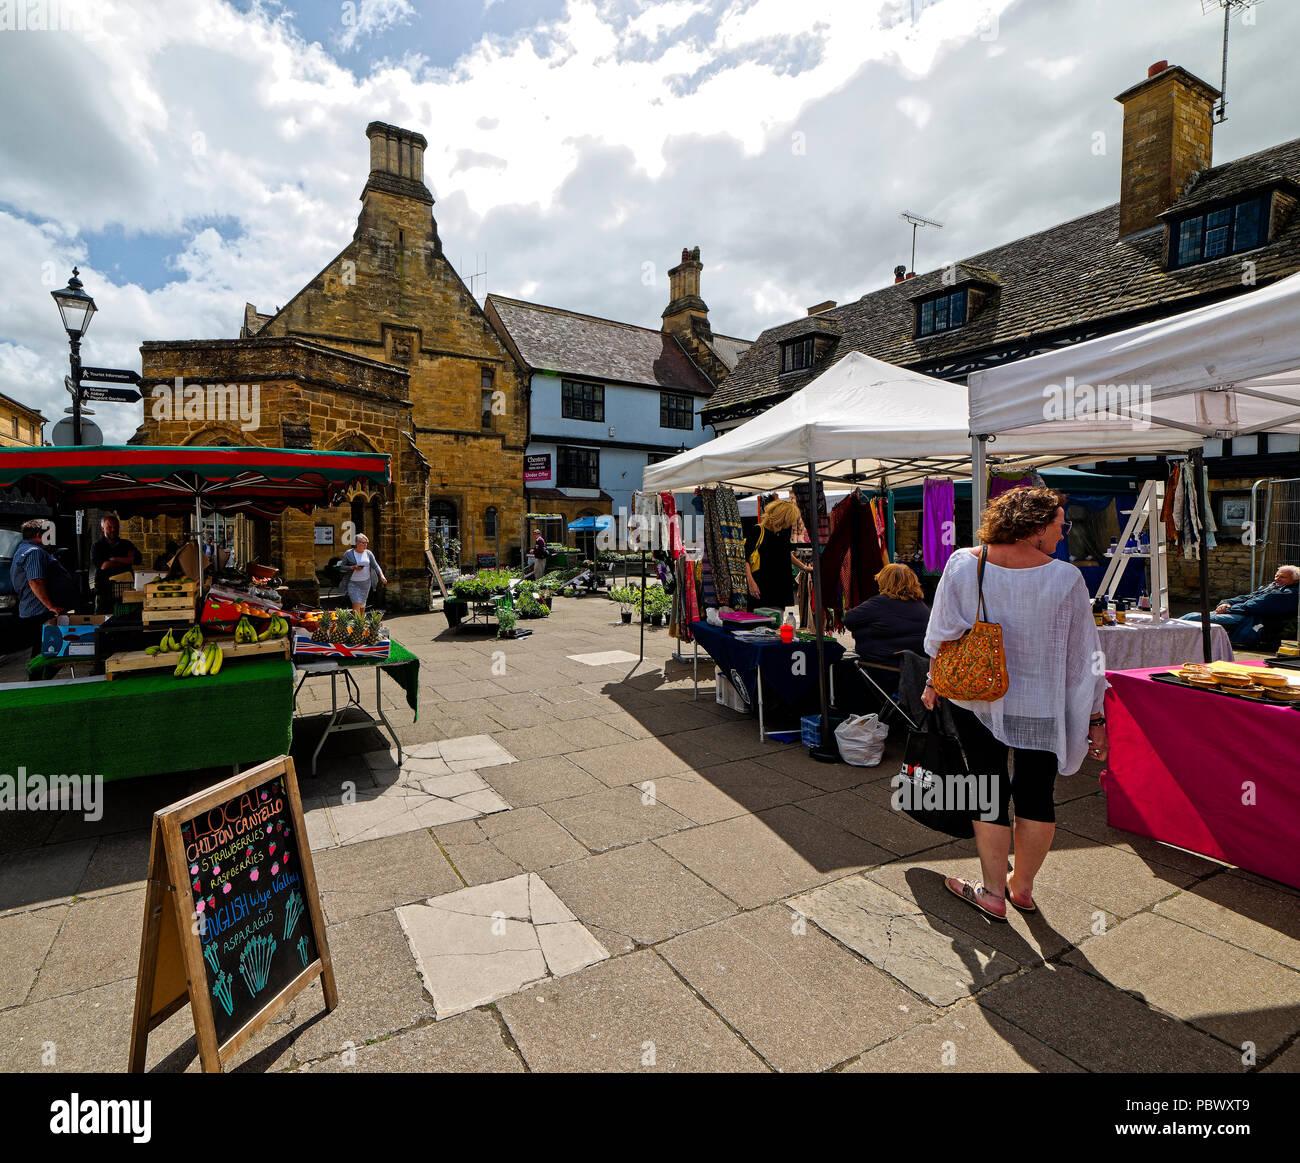 Street scene in Sherborne; a market town in Dorset England UK - Stock Image